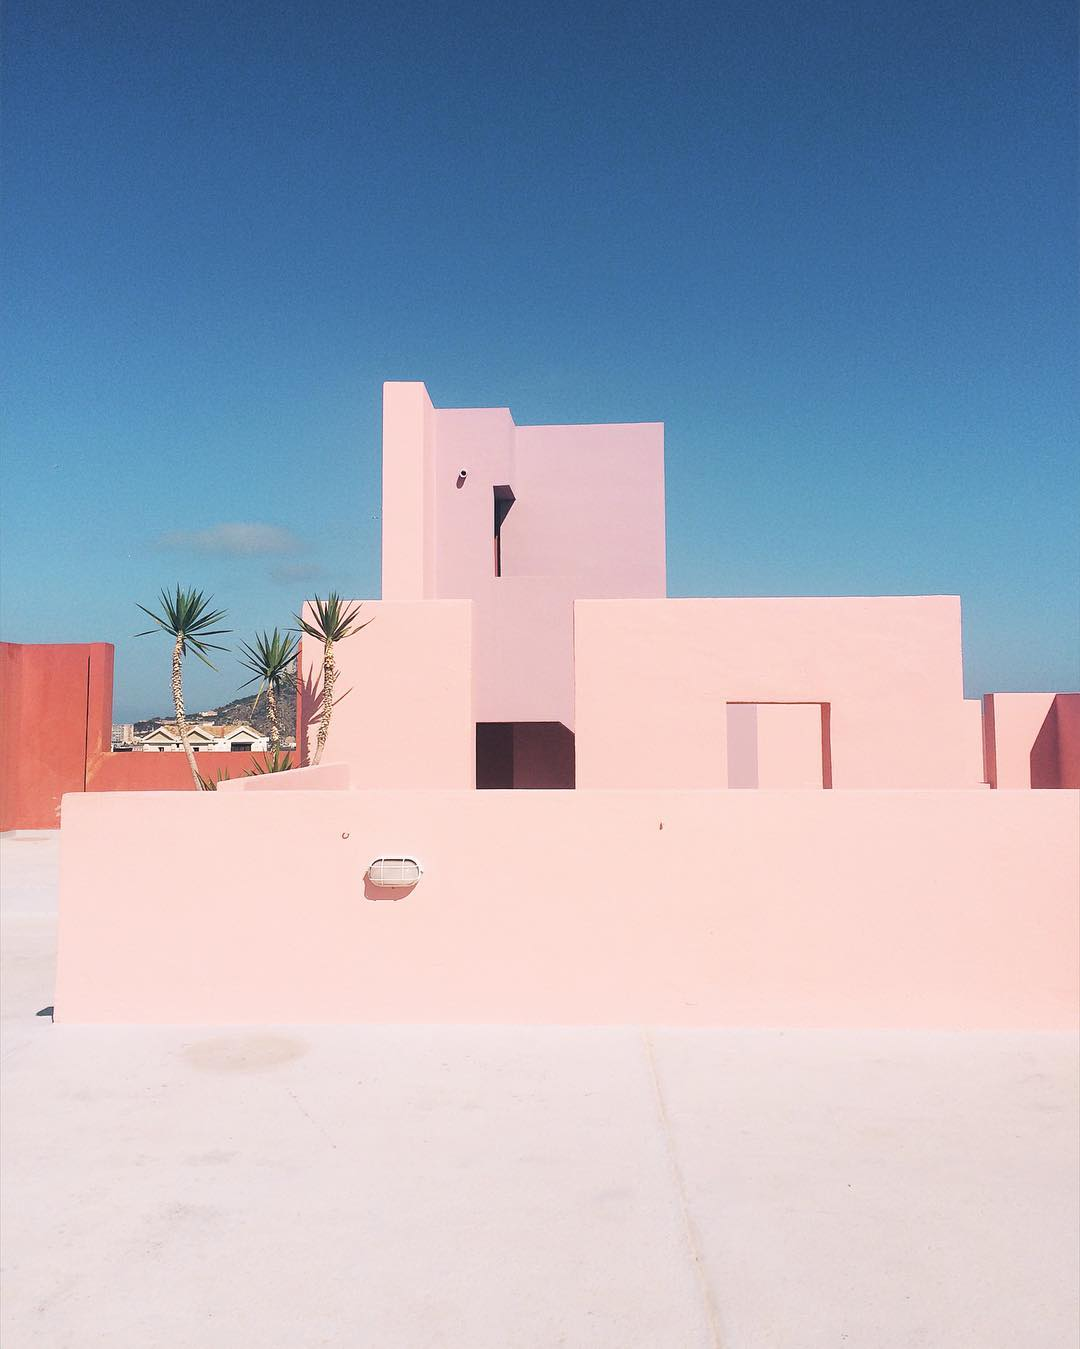 fotografo Joaquin Lucas paleta de colores de Wes Anderson  (34)